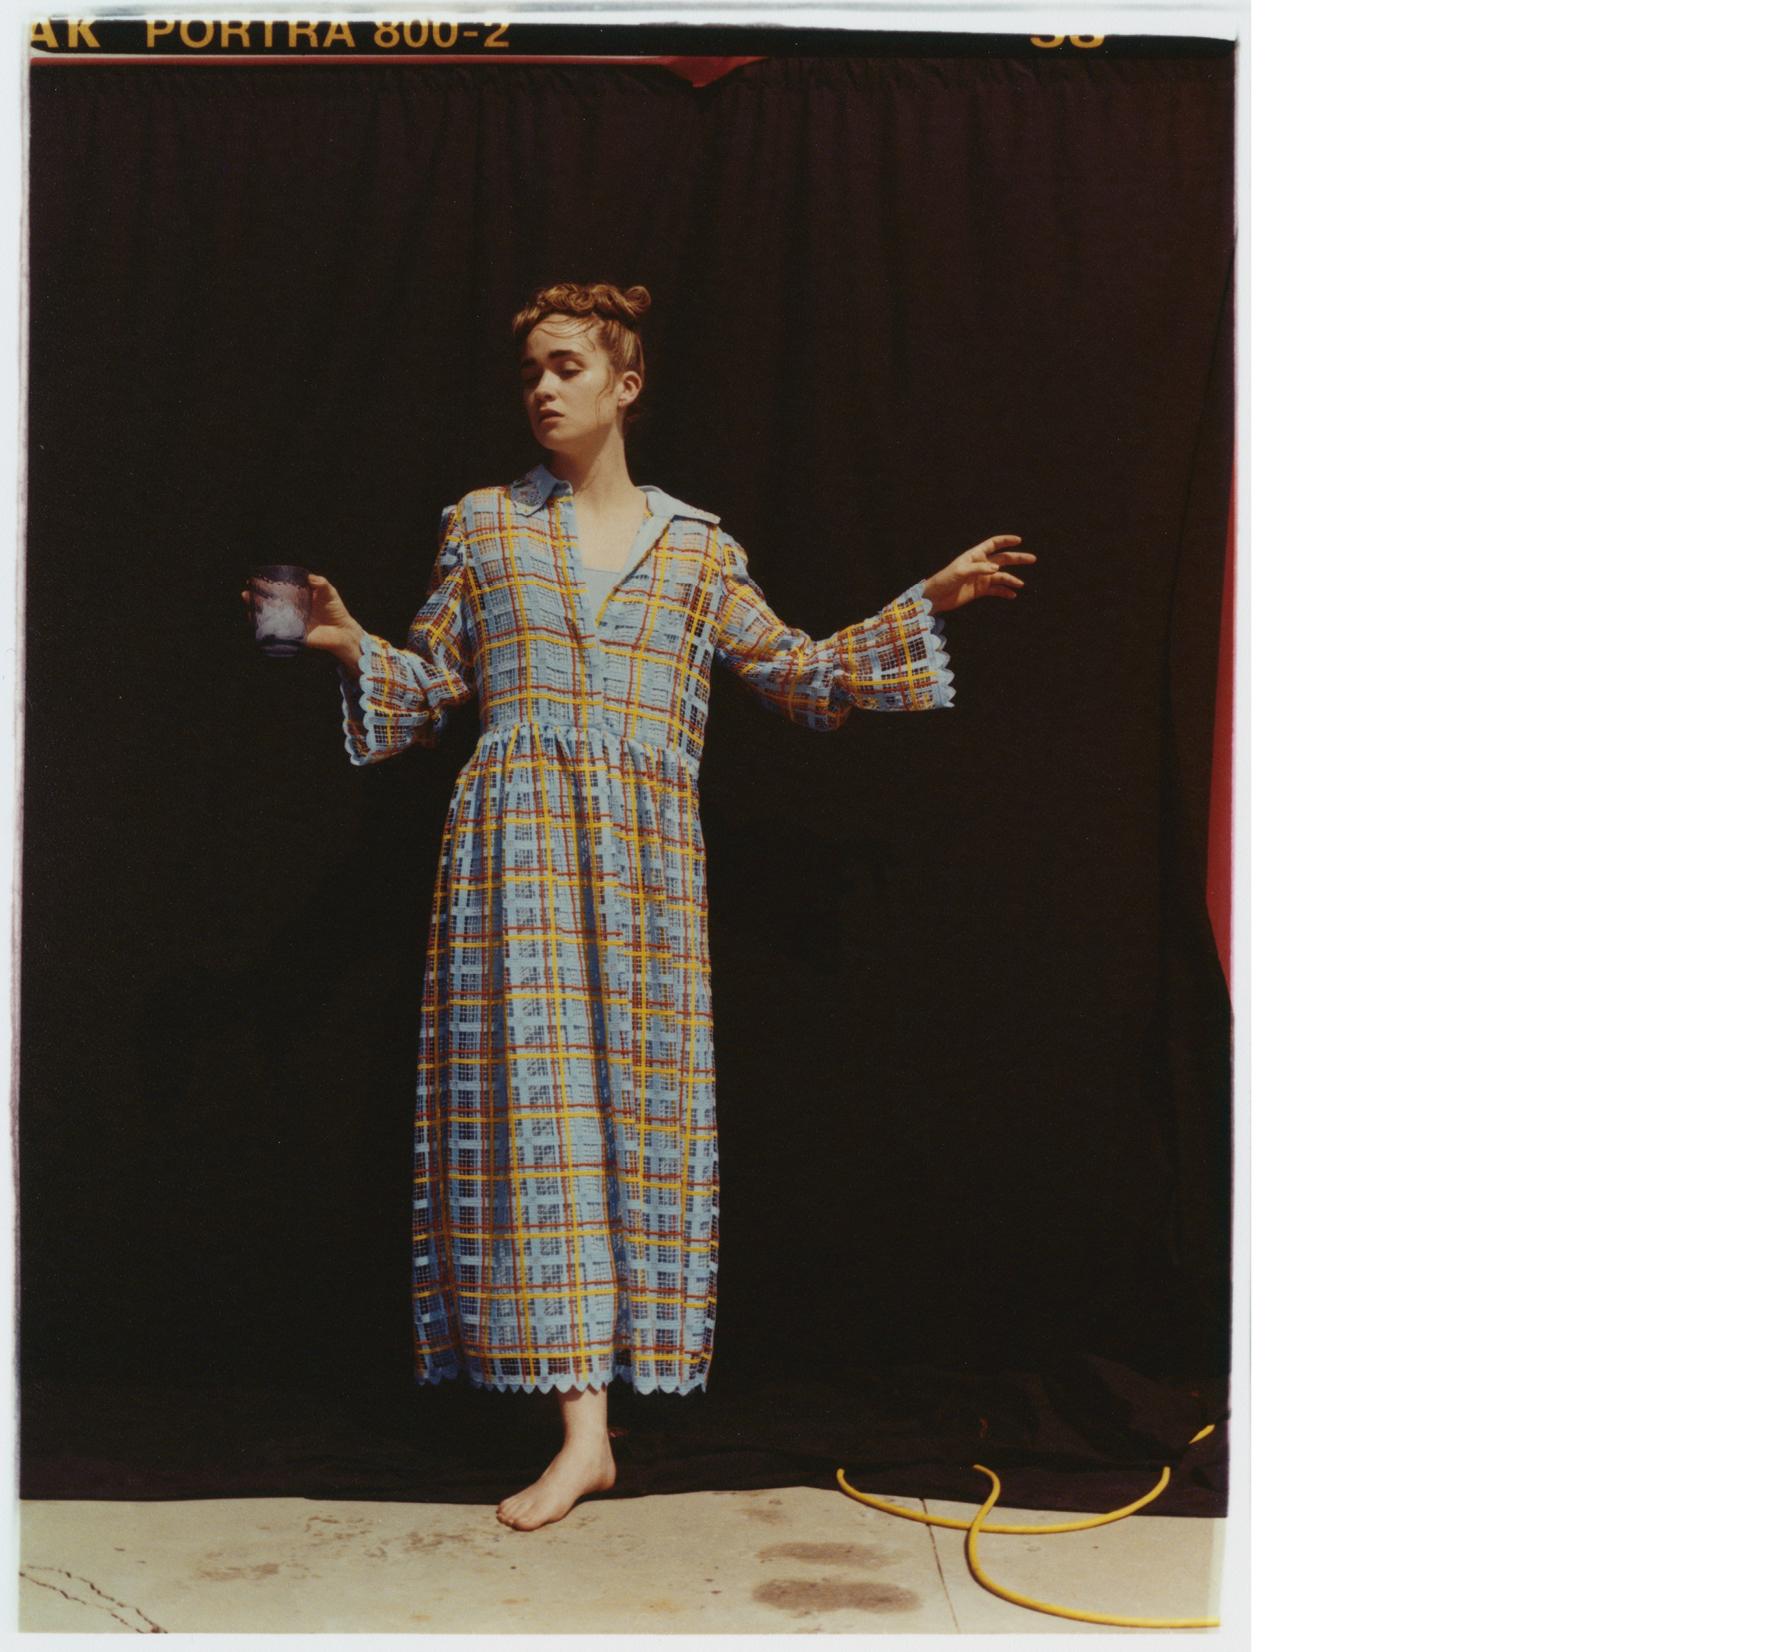 Dress by Vivetta.